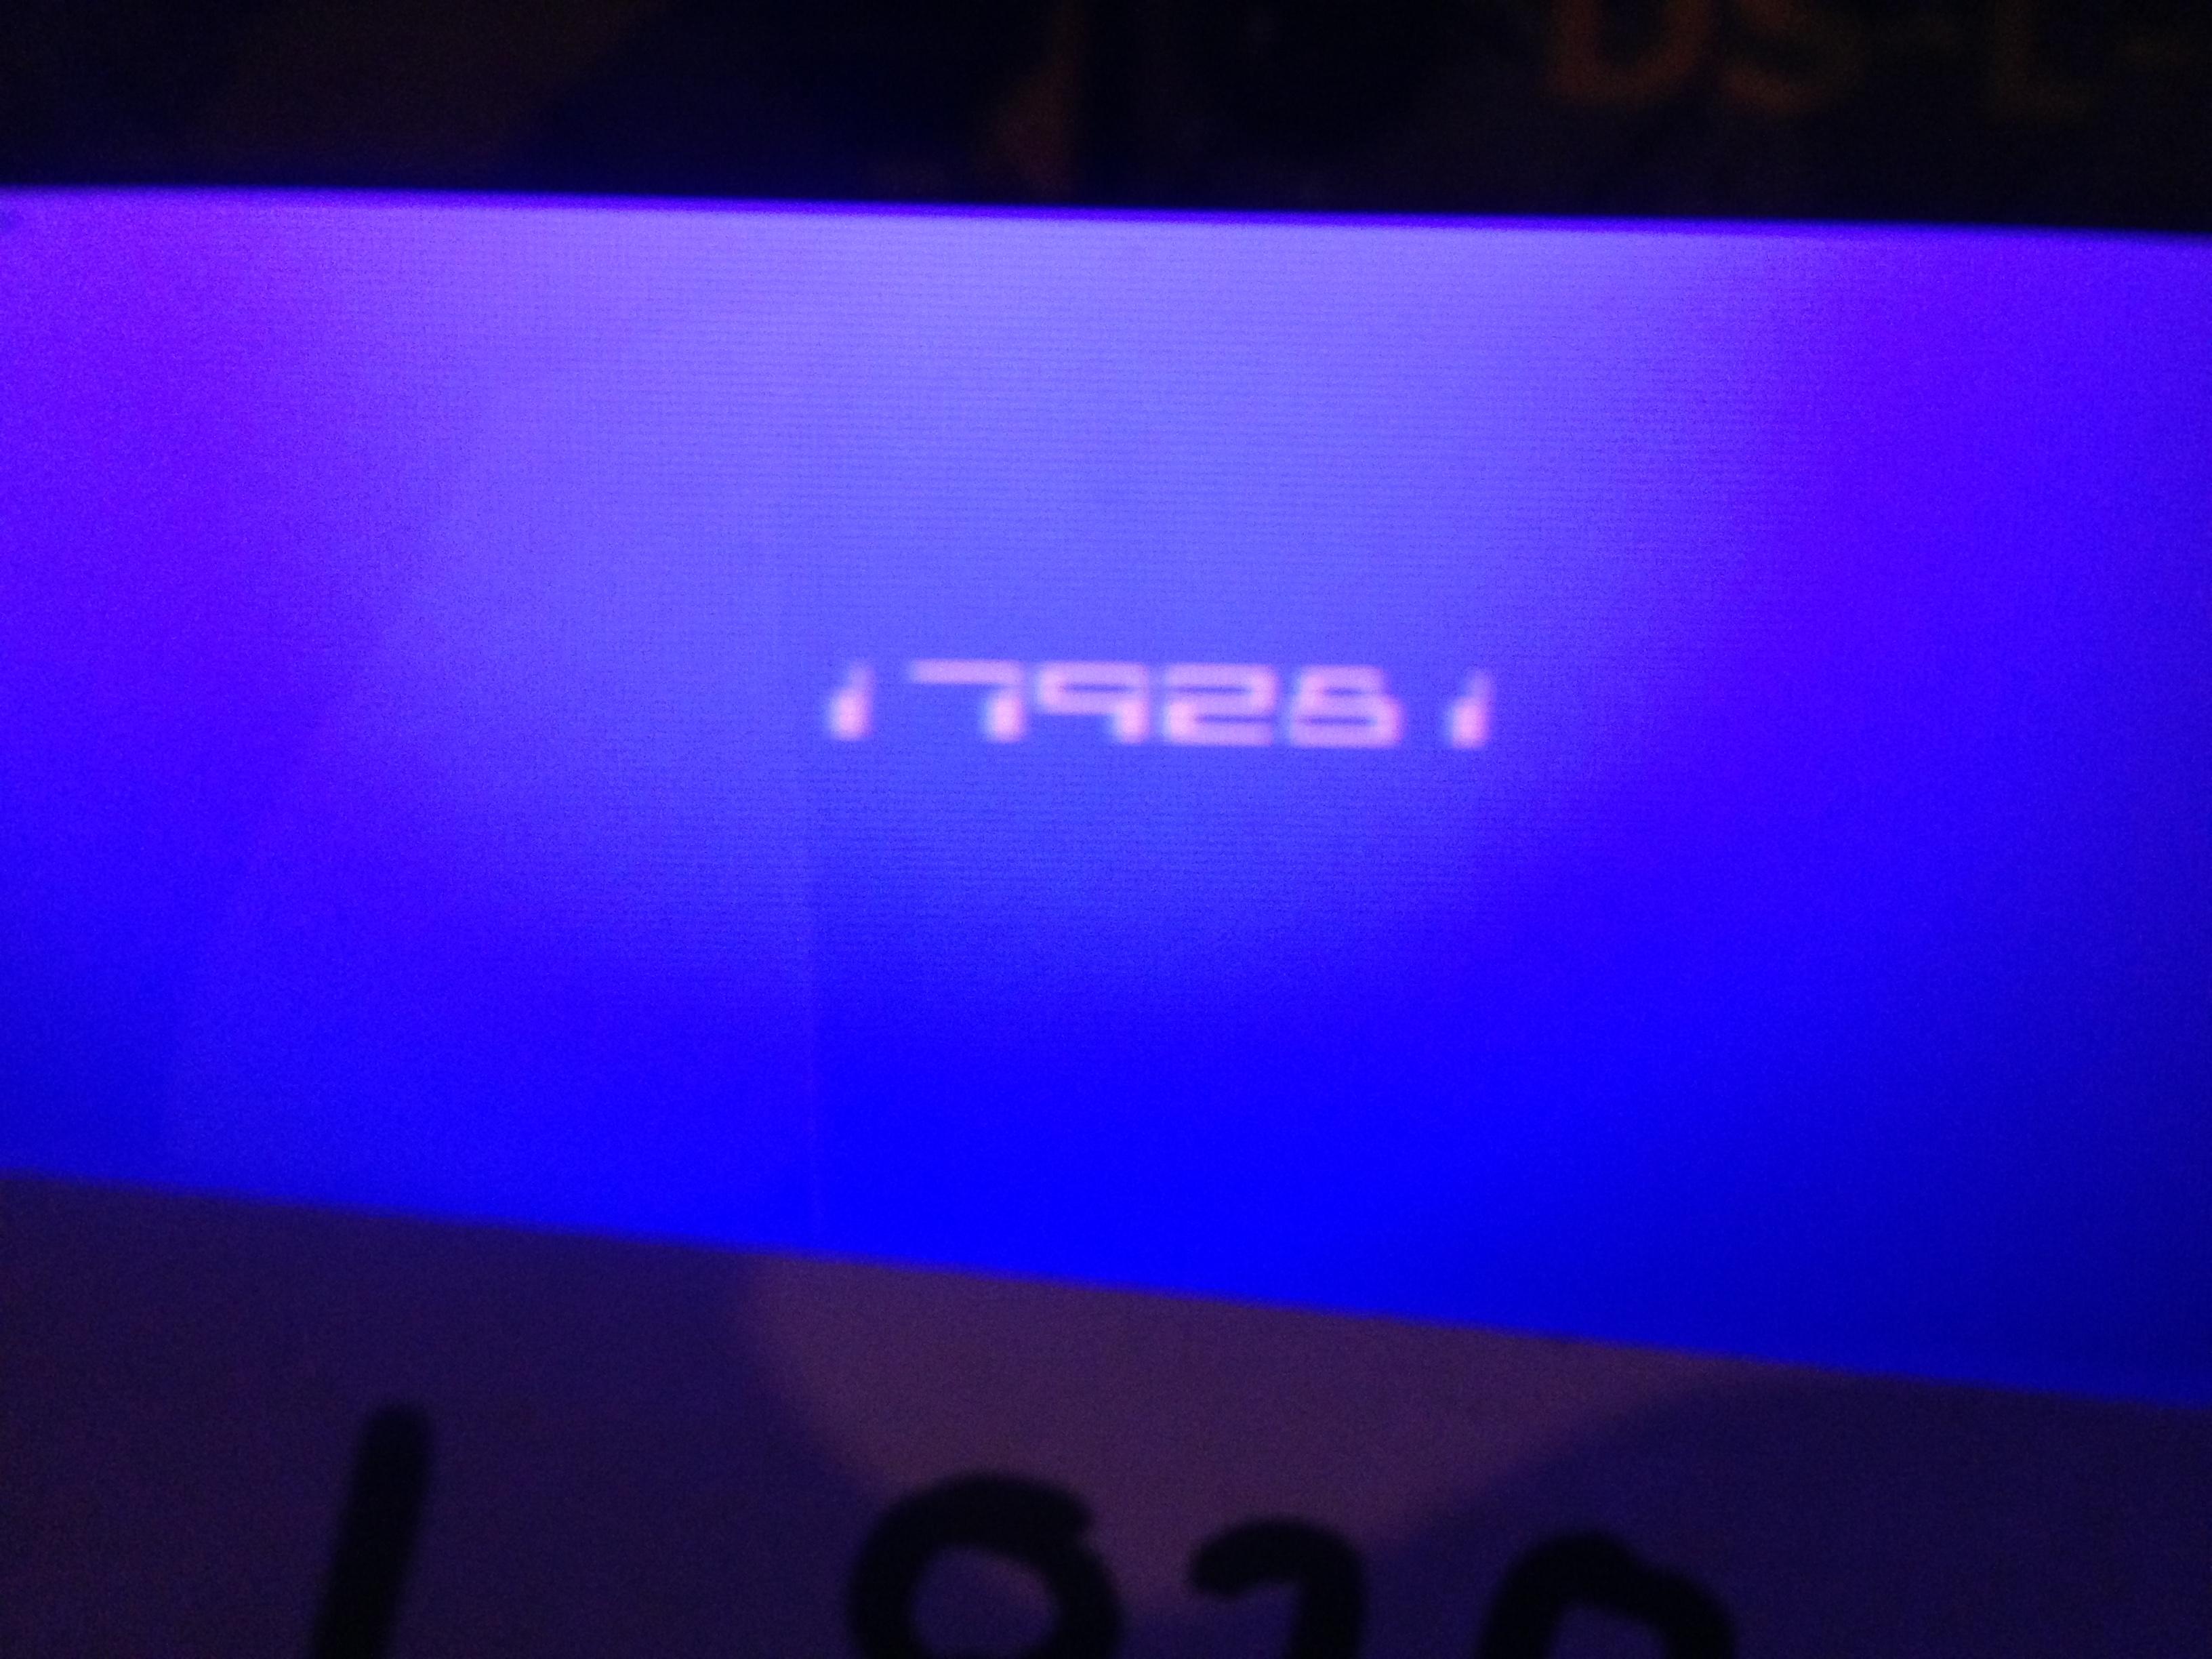 slonda828: Atari Greatest Hits Vol. 2: Yars Revenge (Nintendo DS) 179,261 points on 2014-11-16 10:50:49